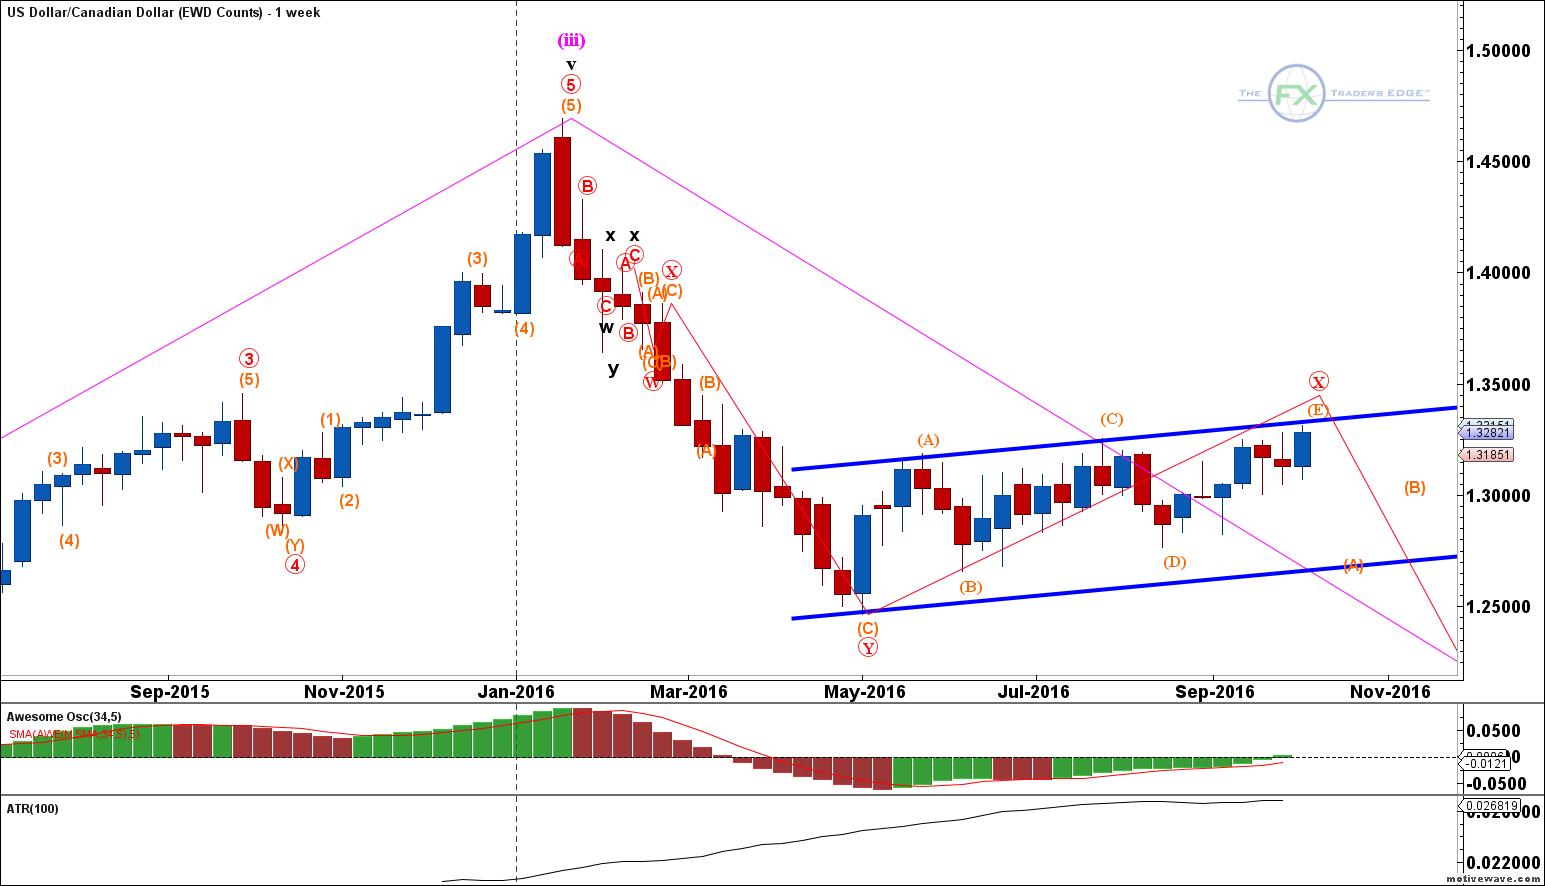 Usdcad Ewd Counts Oct 07 1242 Pm 1 Week Fx Trader S Edge